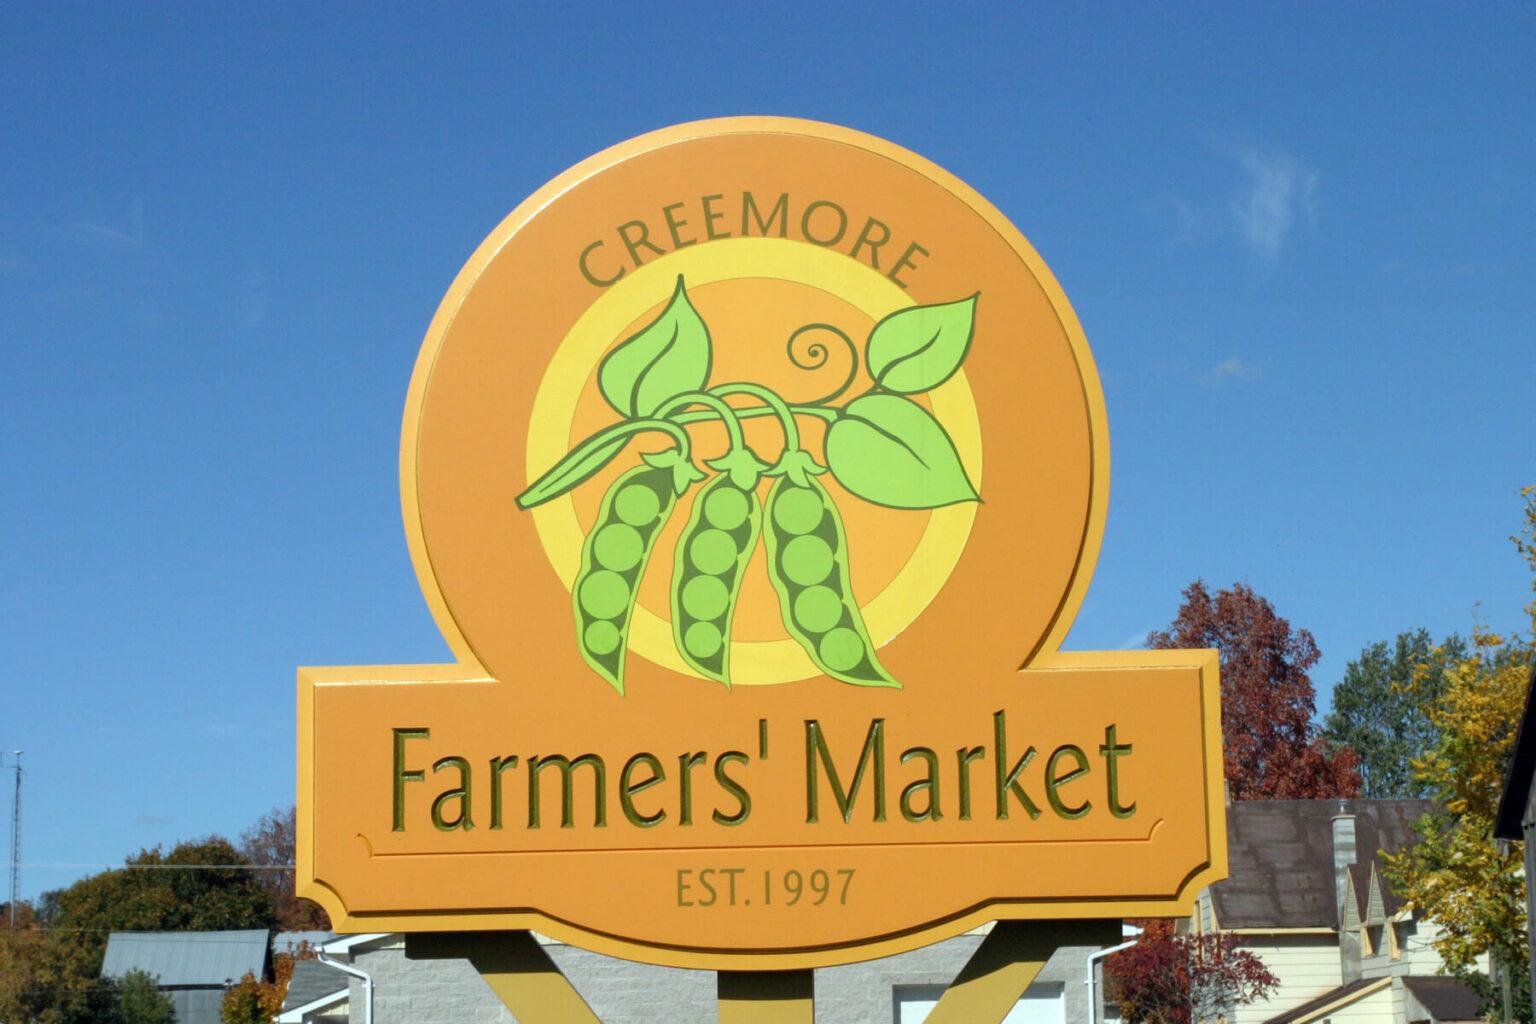 Creemore Farmers Market